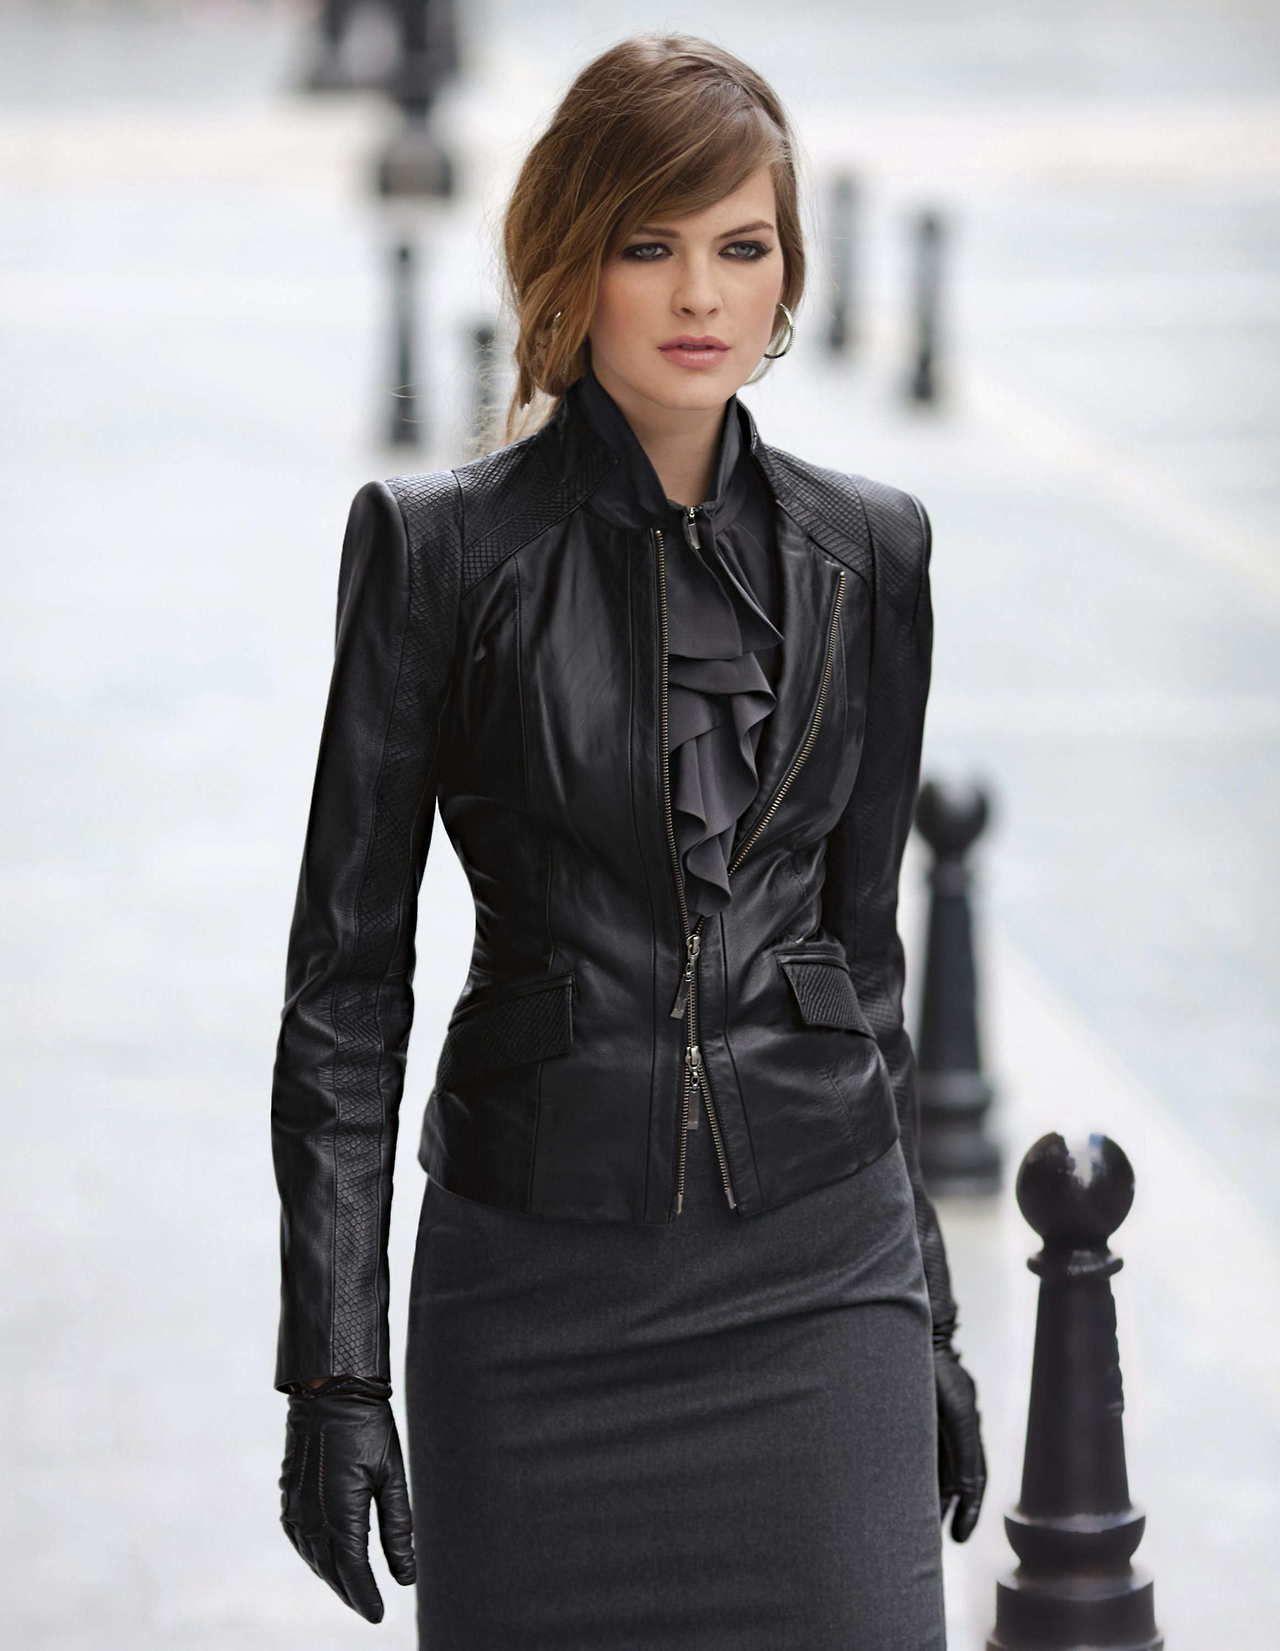 Women wearing leather coats